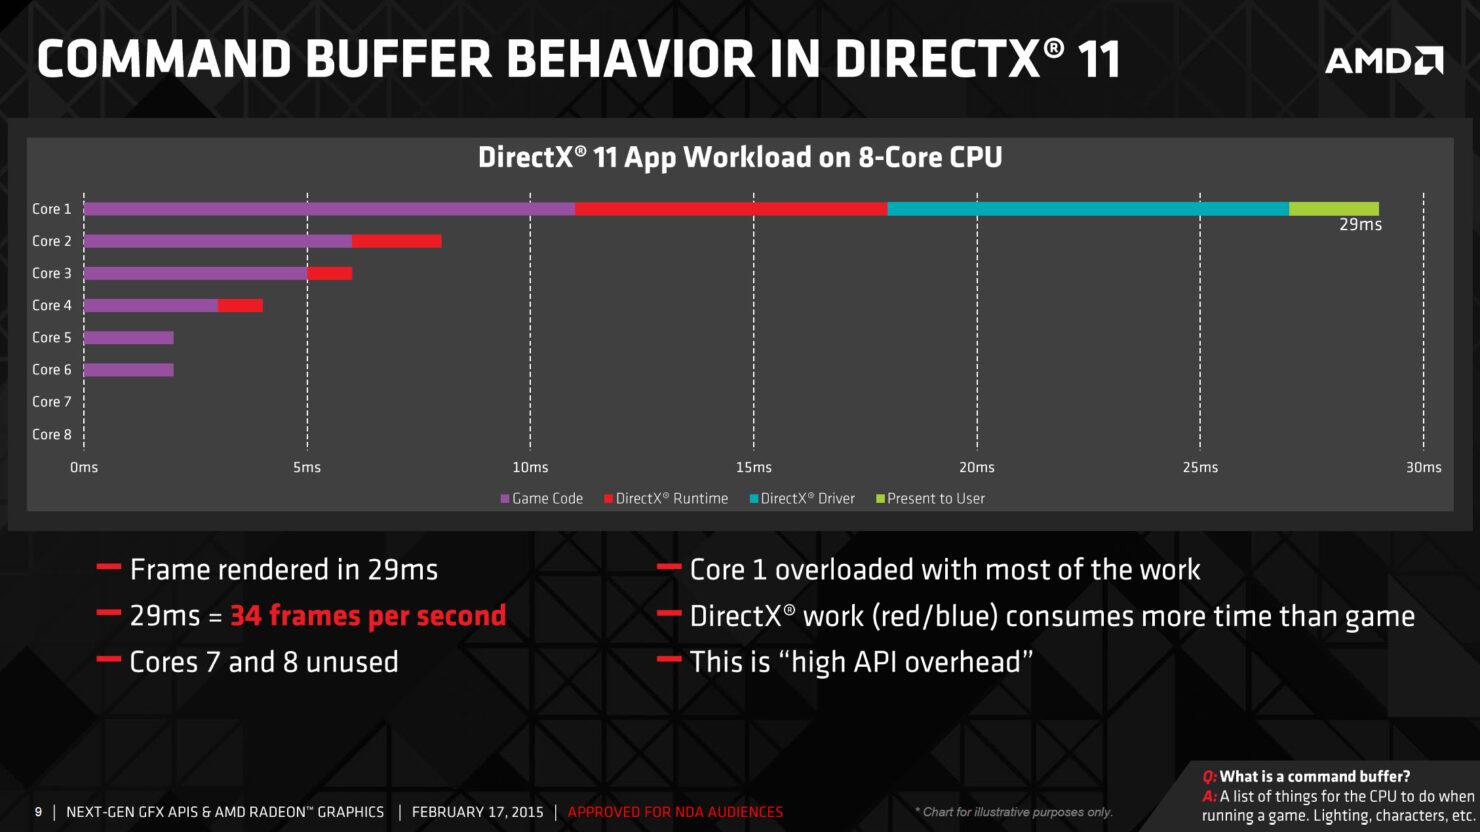 amd-command-buffer-directx-11